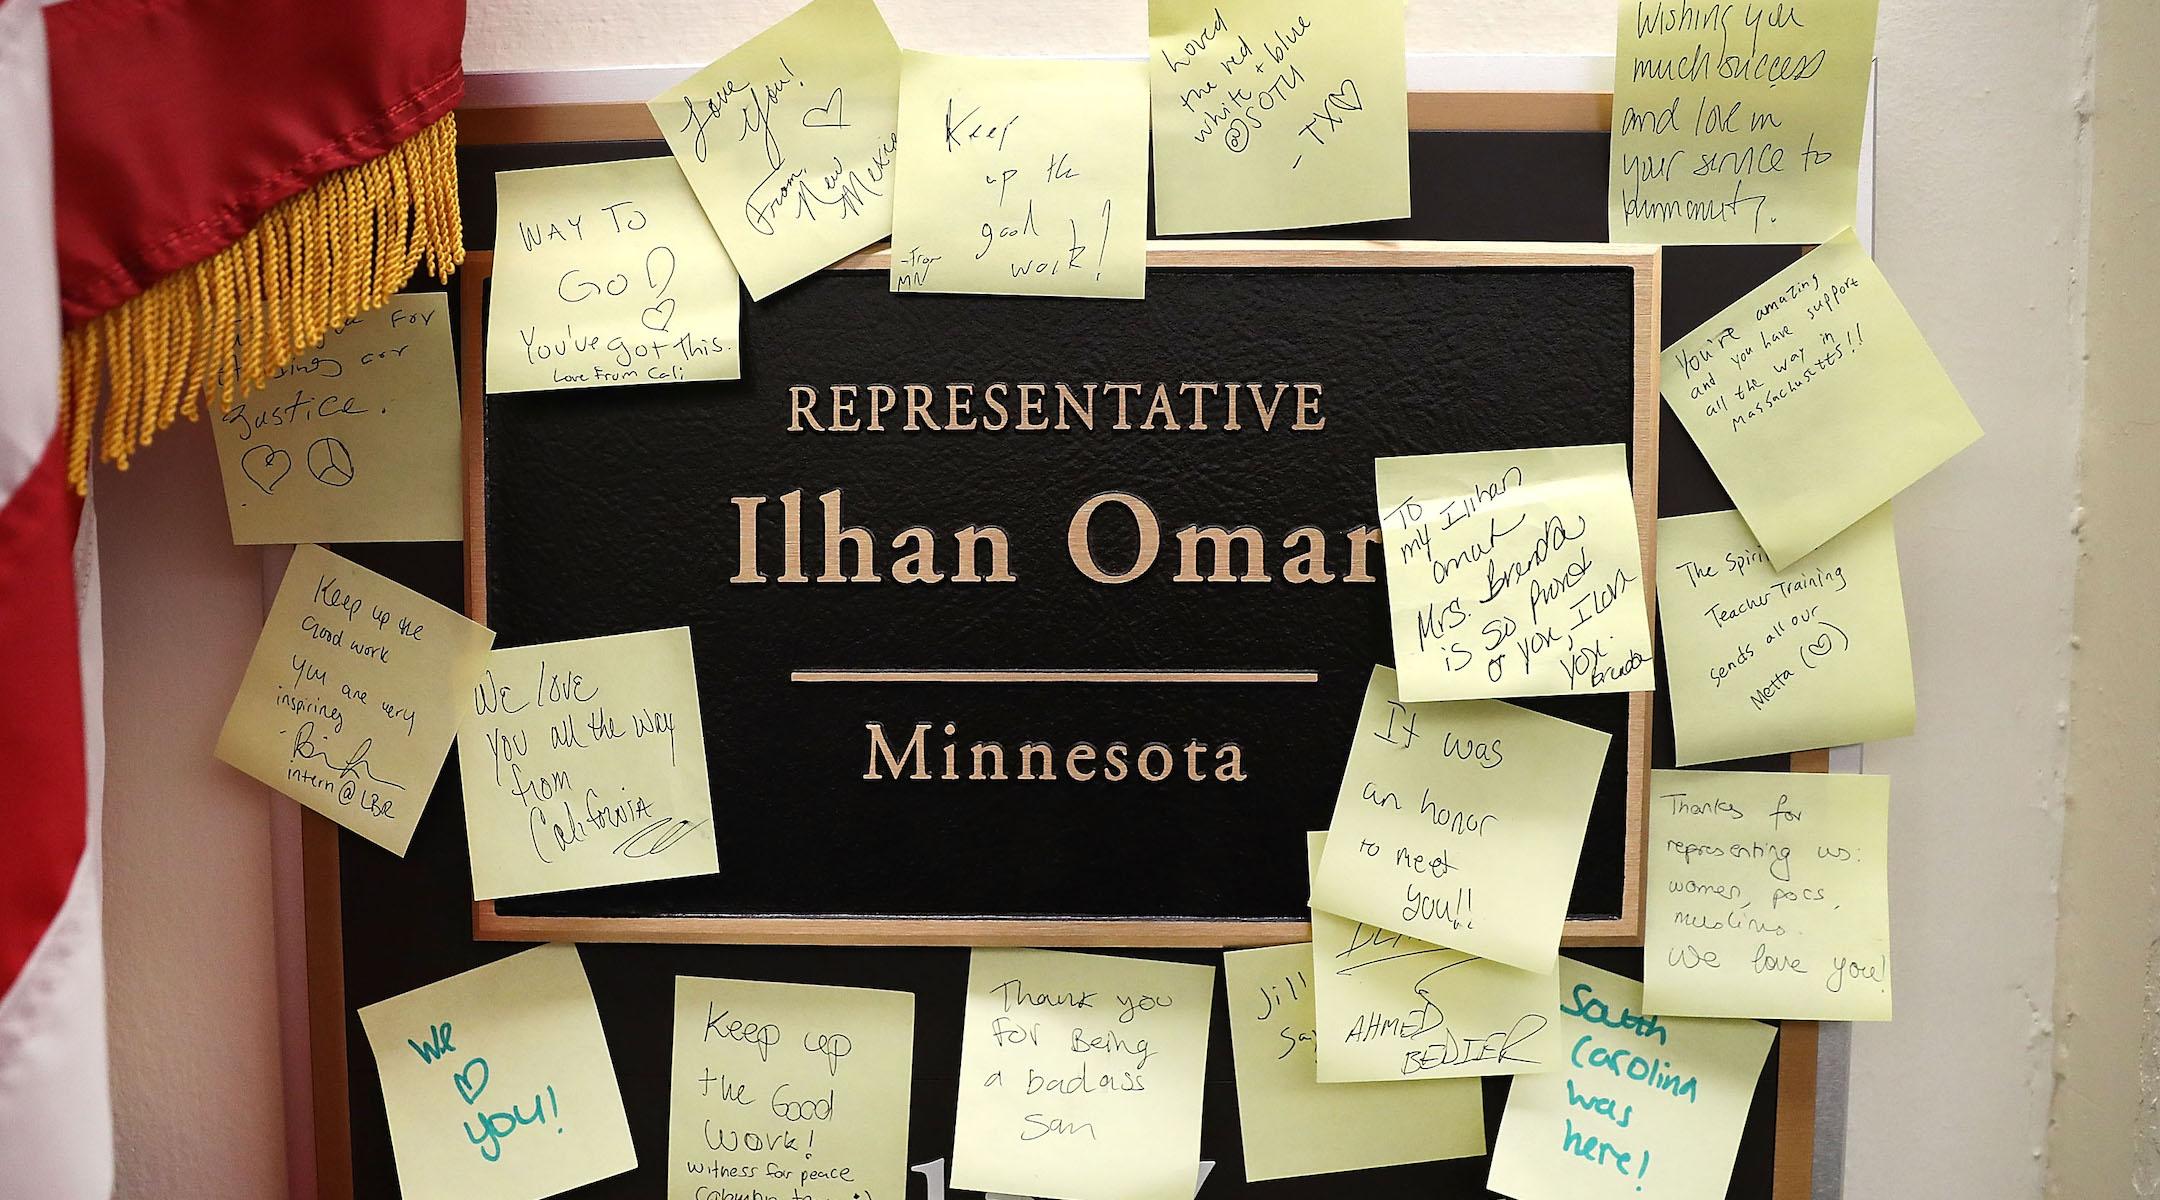 Ilhan Omar office